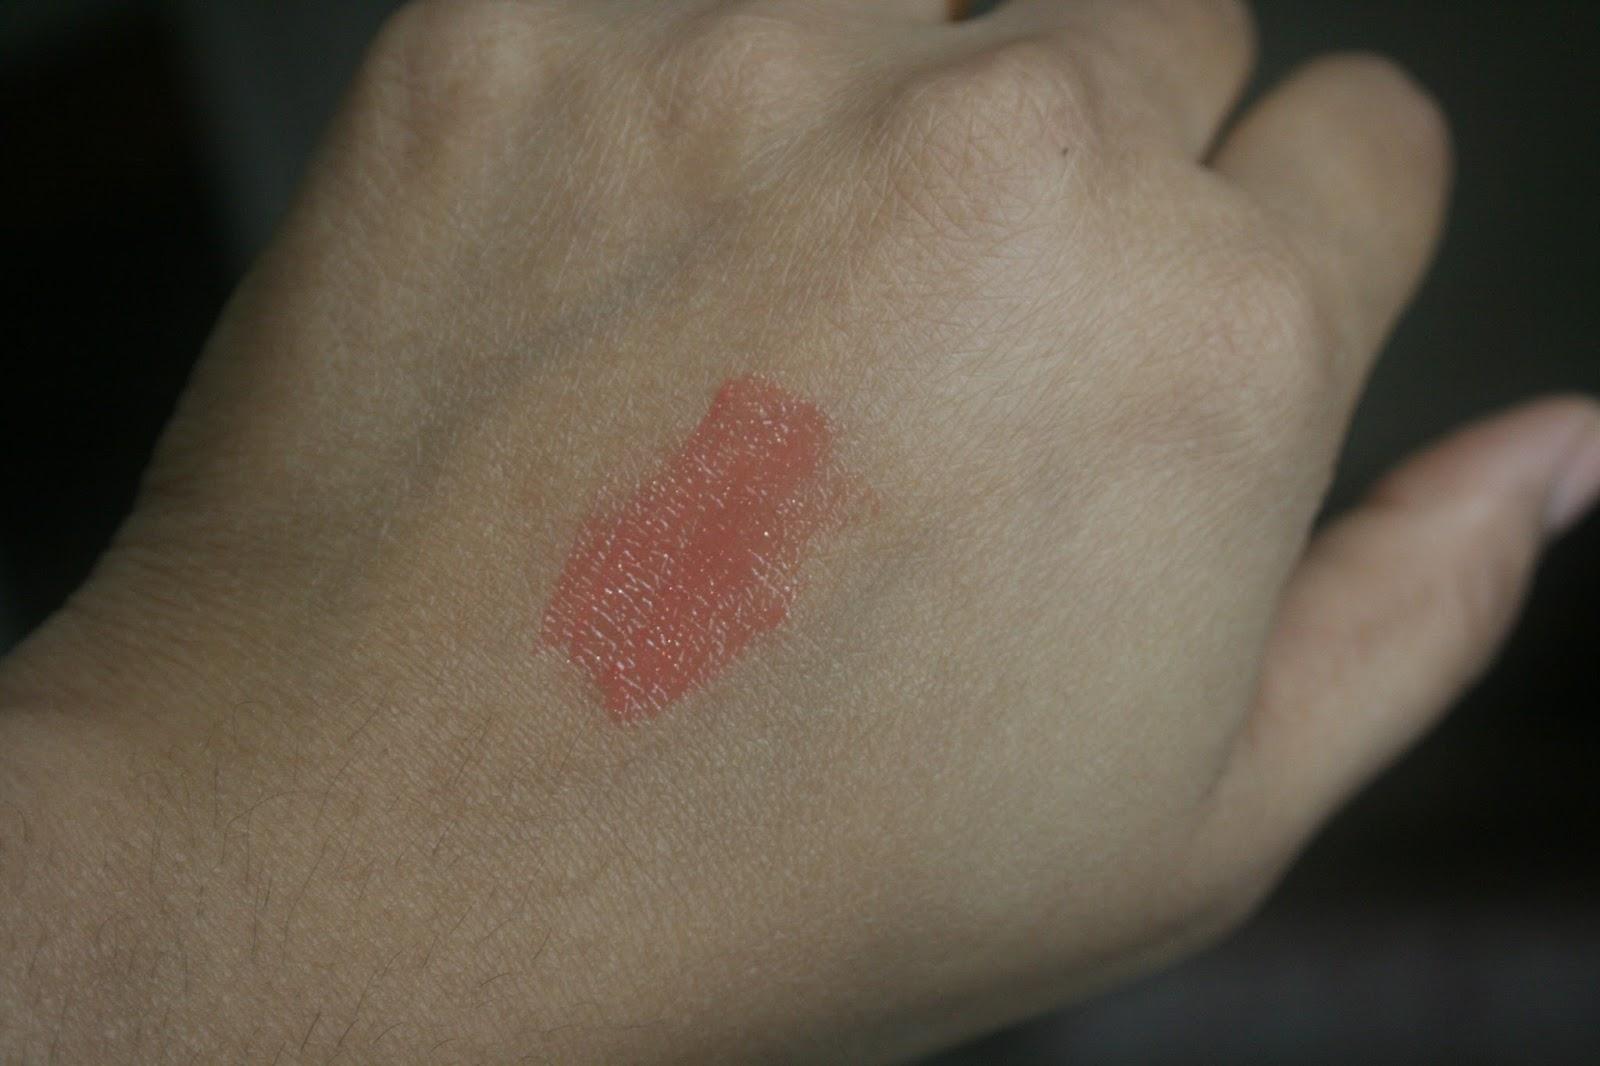 Guerlain Gloss d'Enfer Maxi Shine Lip Gloss in Nahema Smack Swatch